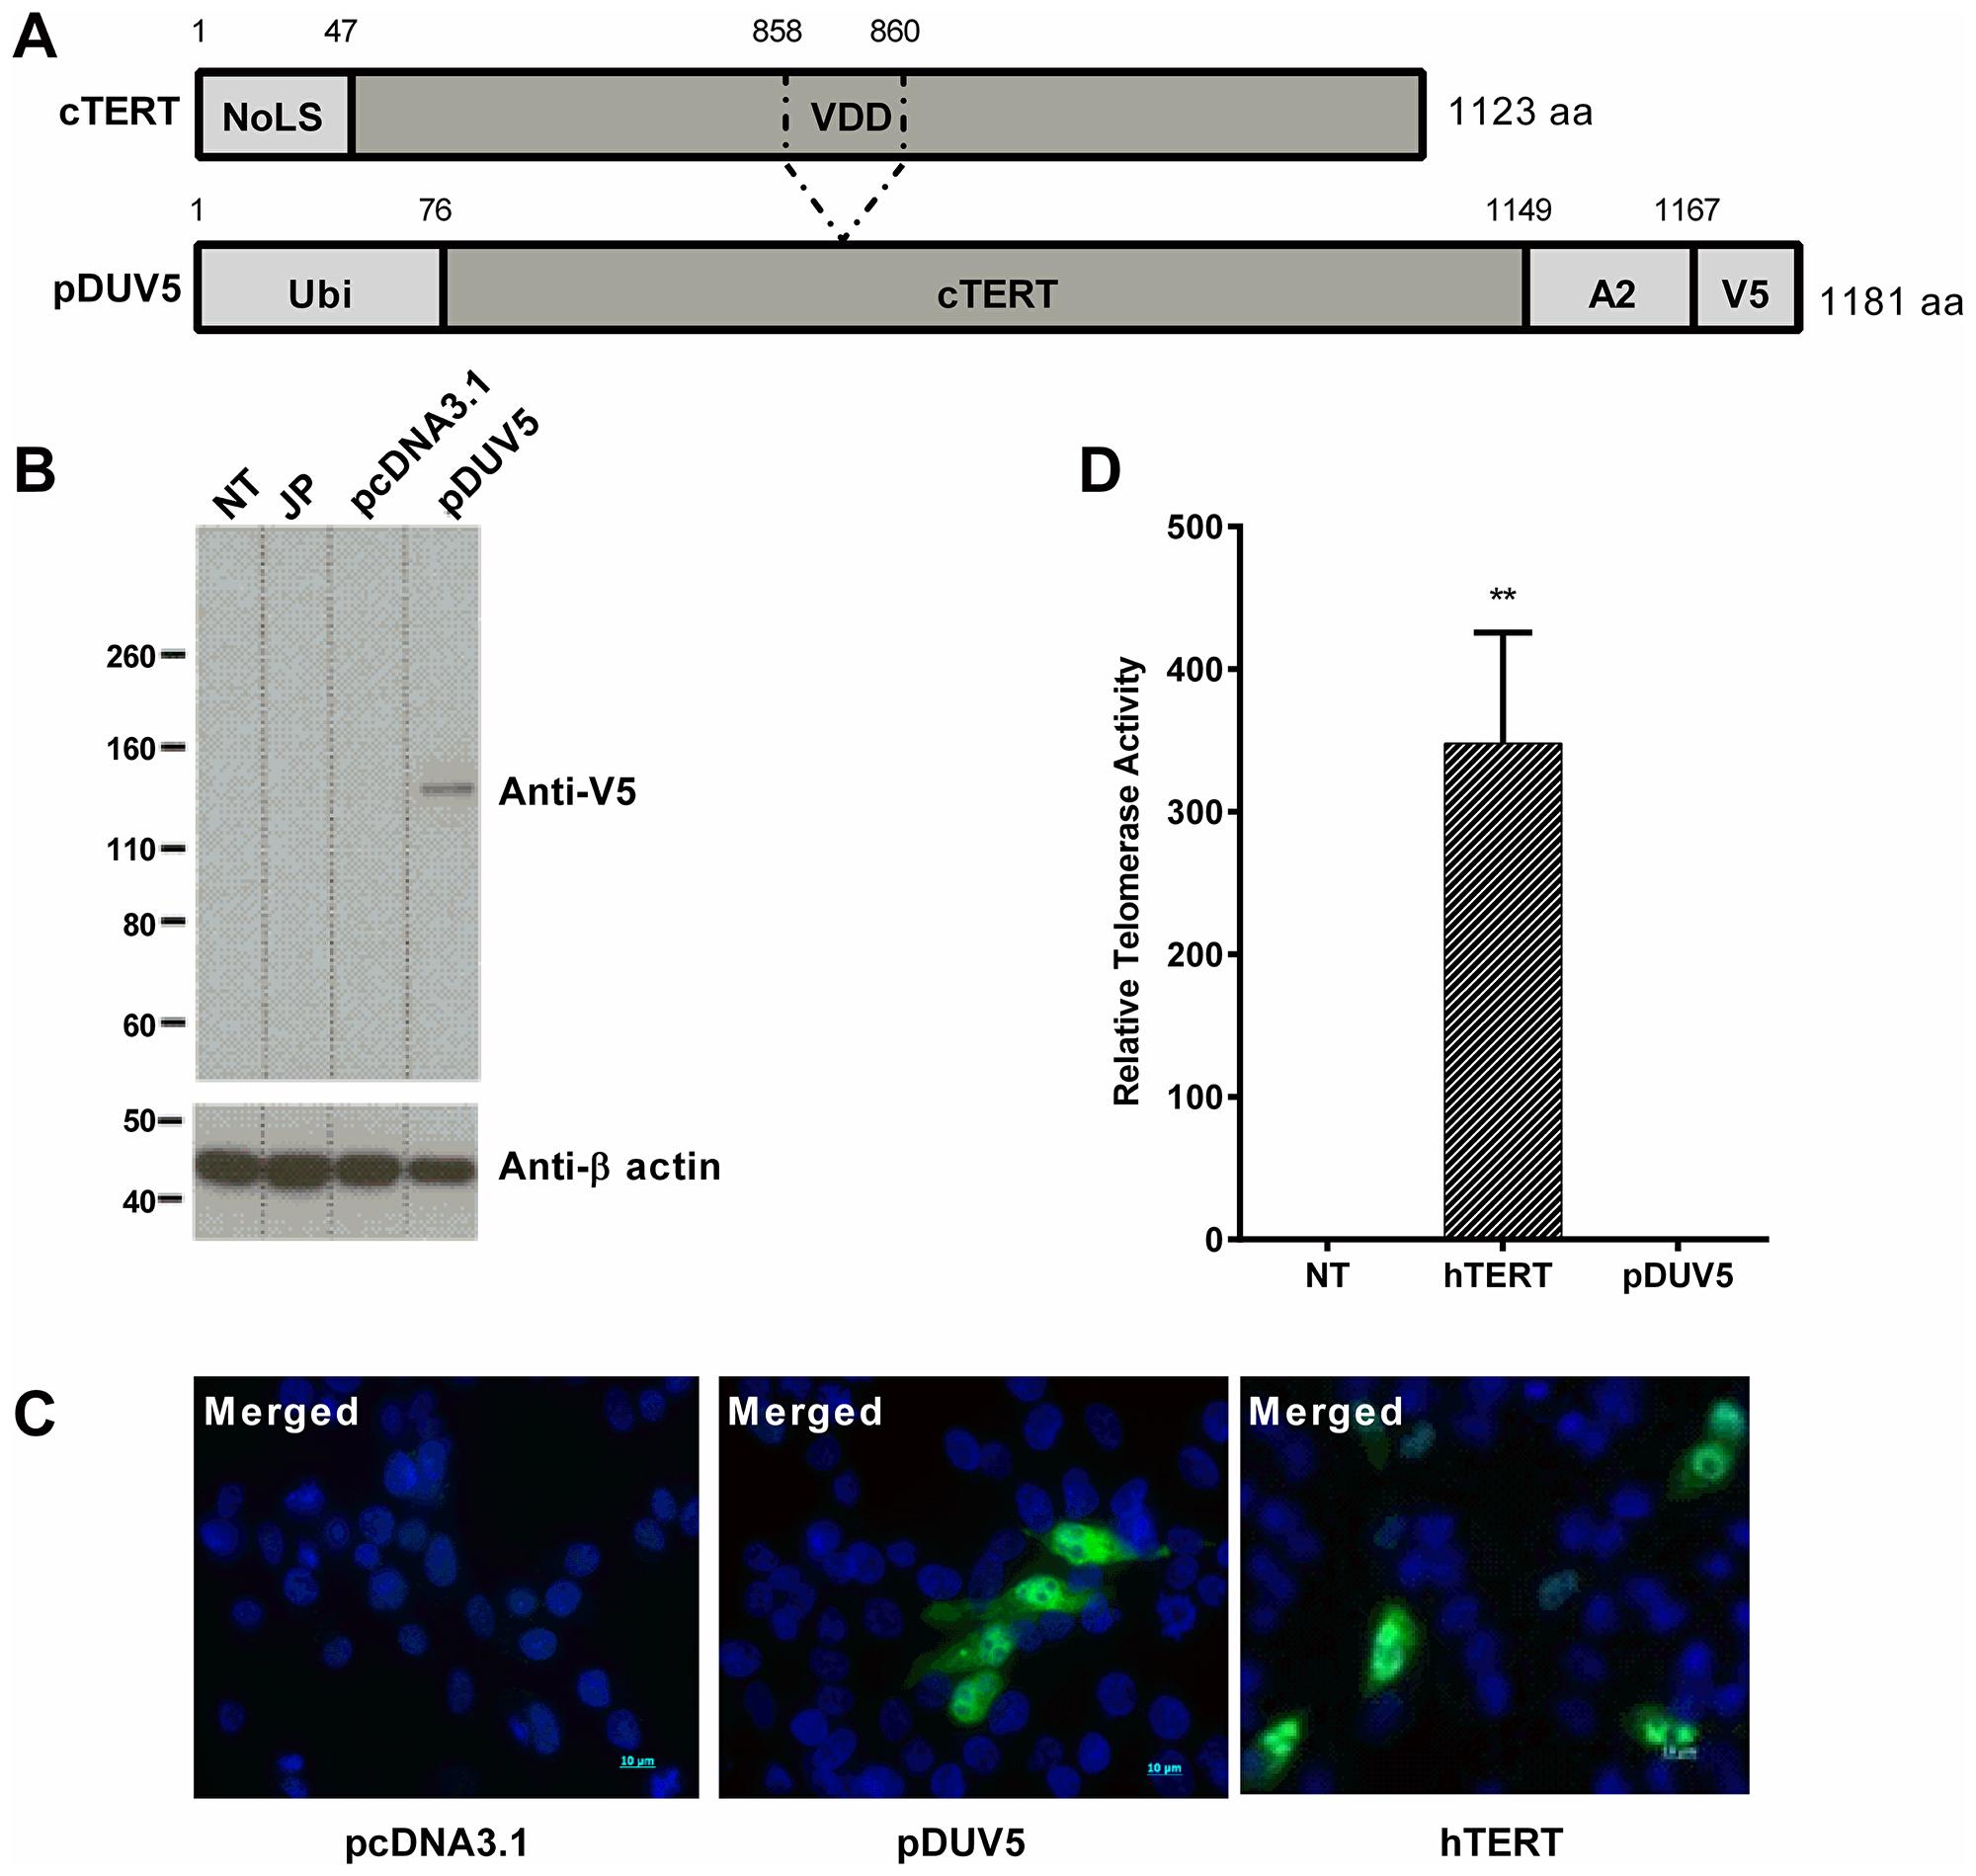 In vitro characterization of pDUV5 protein.